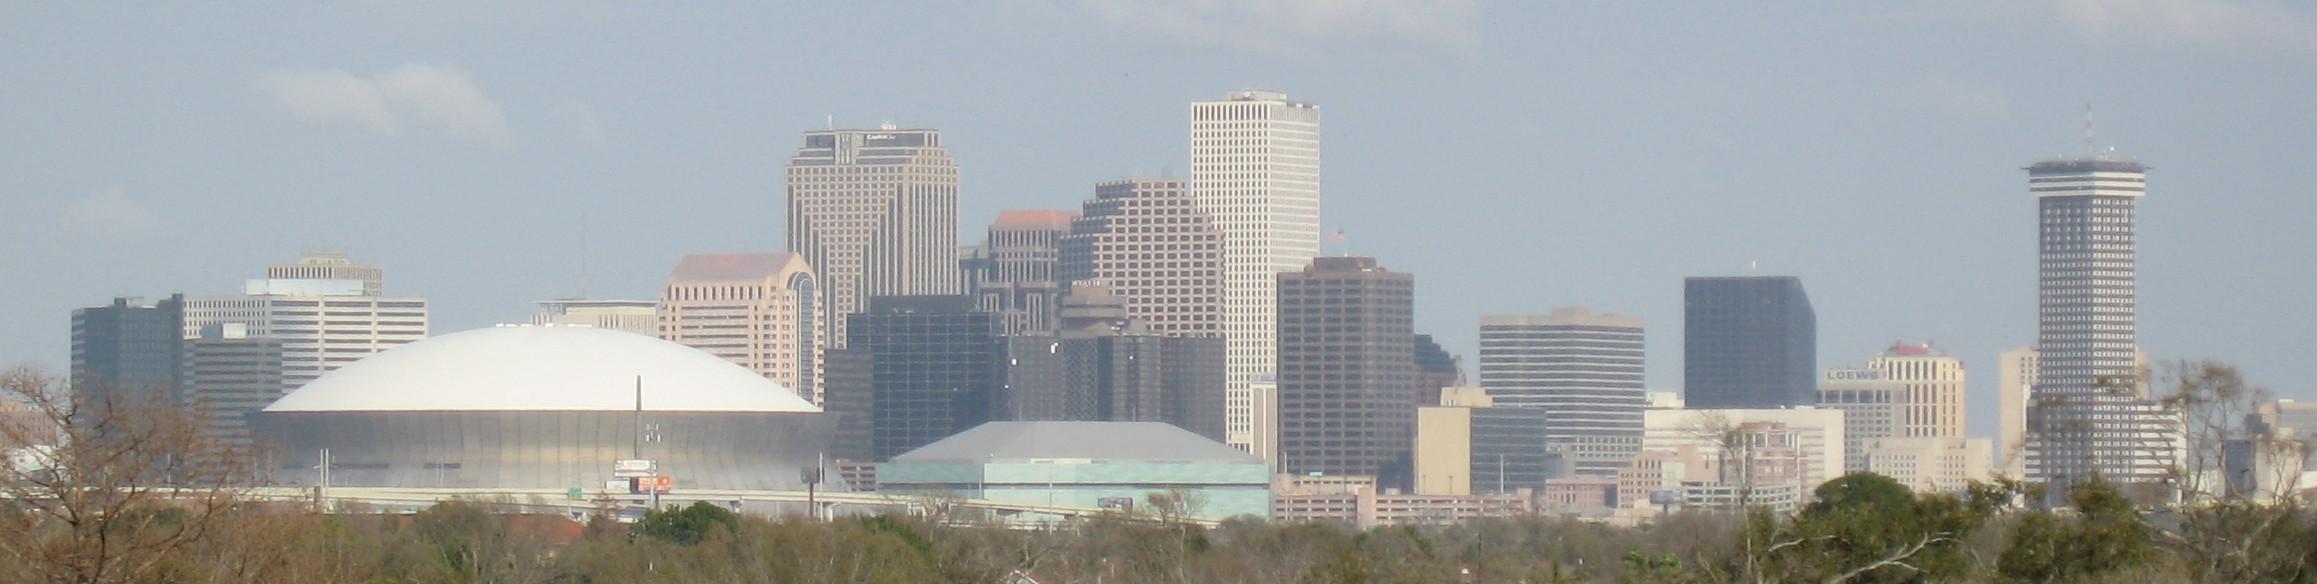 external image New_Orleans_Skyline_from_Uptown.jpg